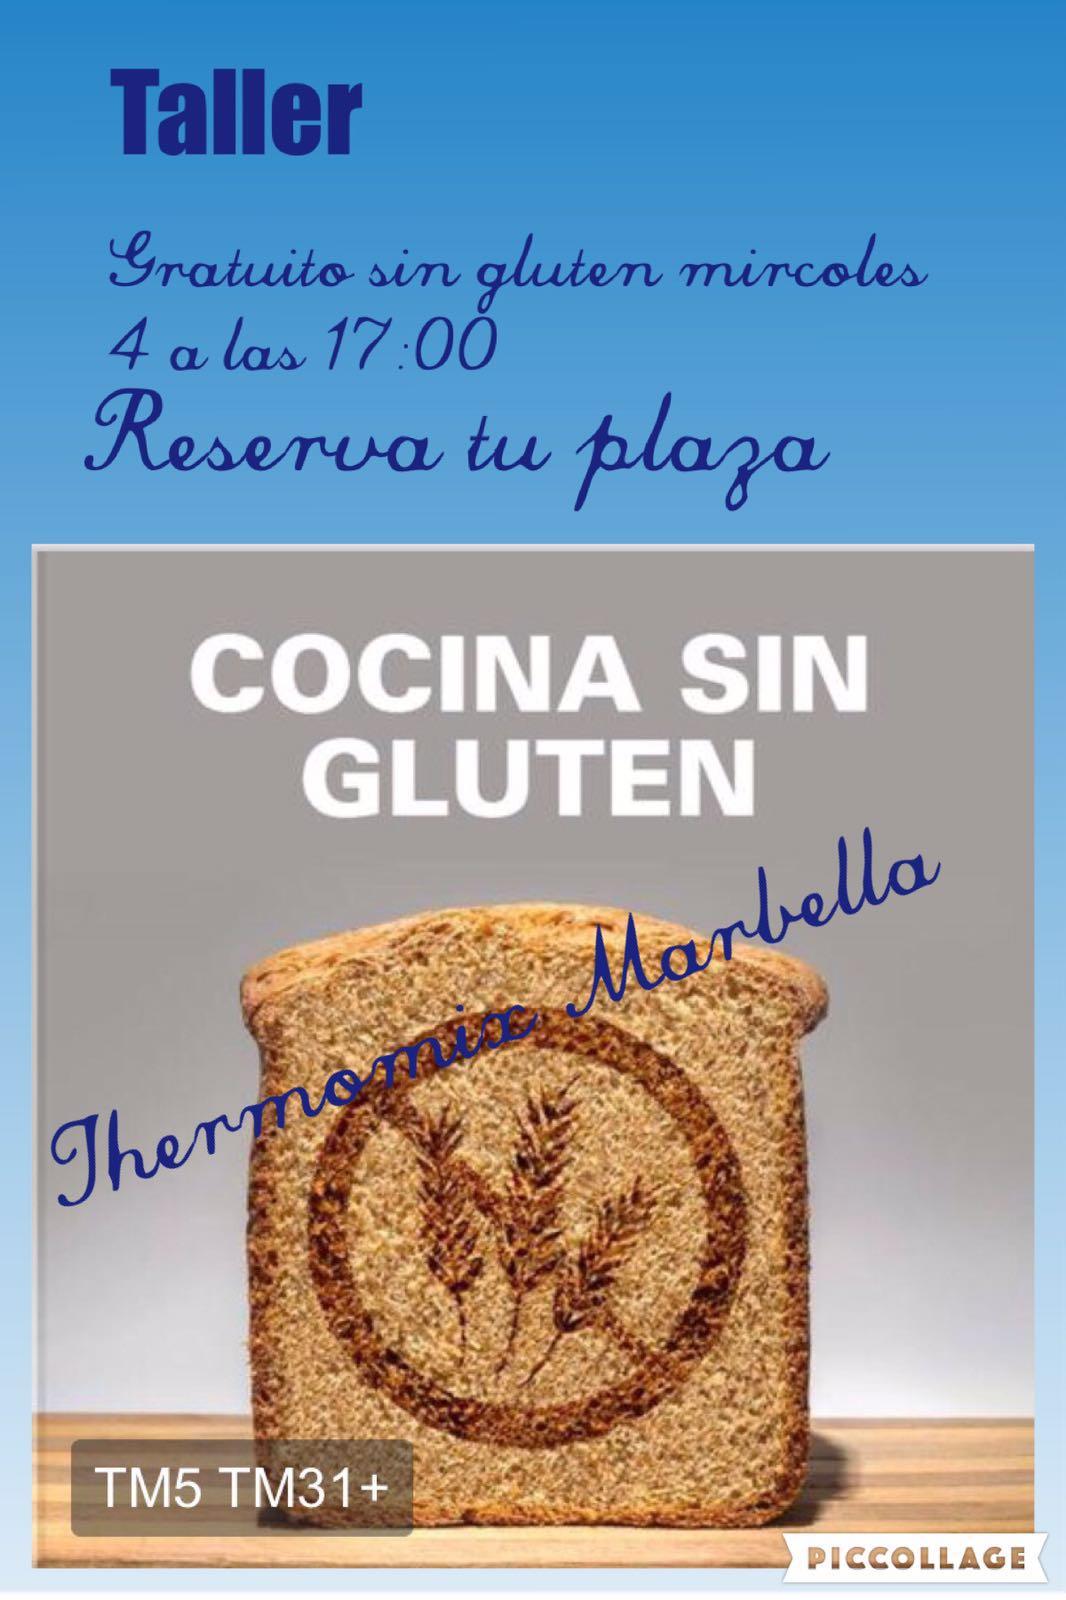 taller sin gluten en delegación marbella